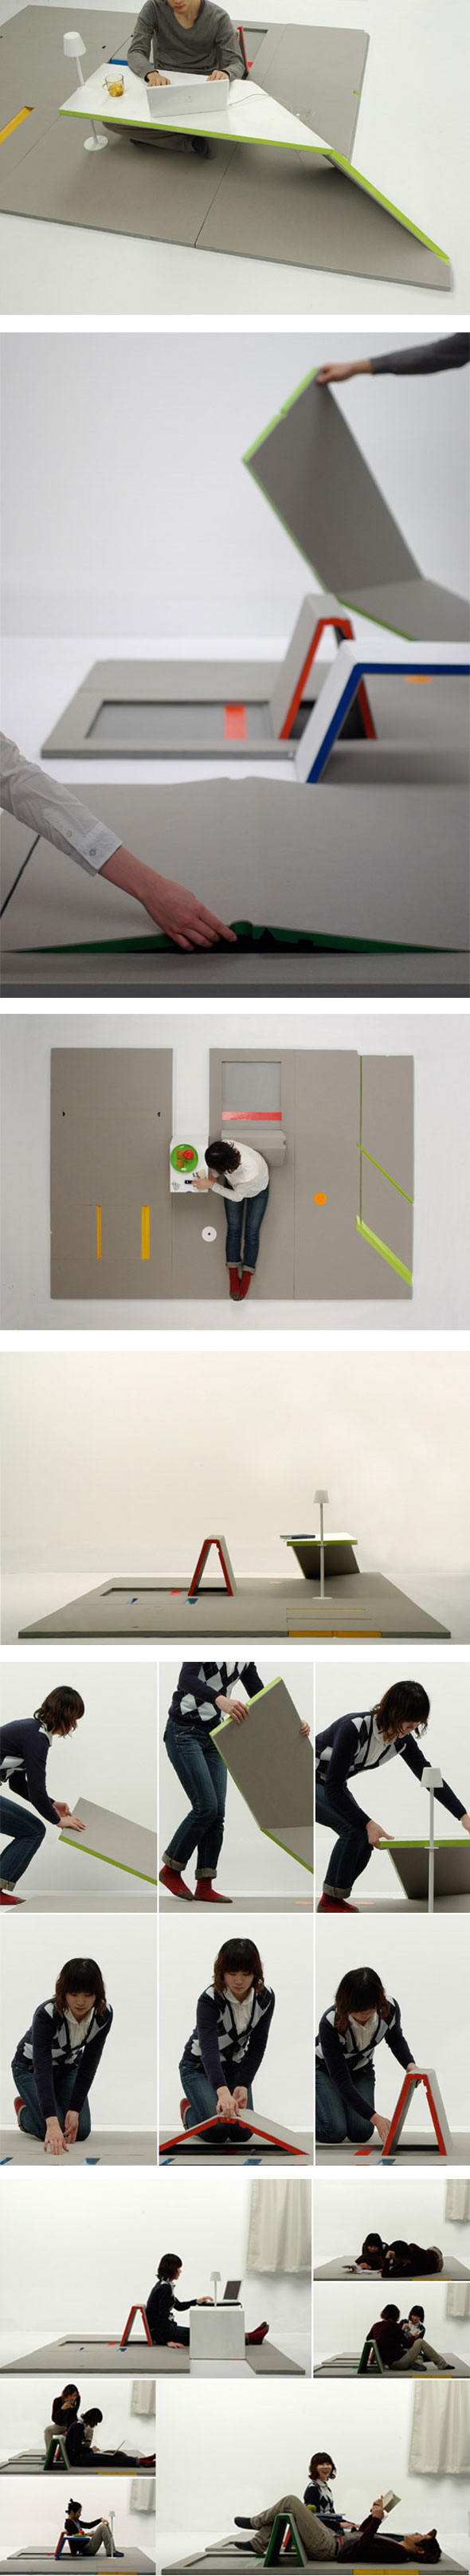 Land Peel / Shin Yamashita